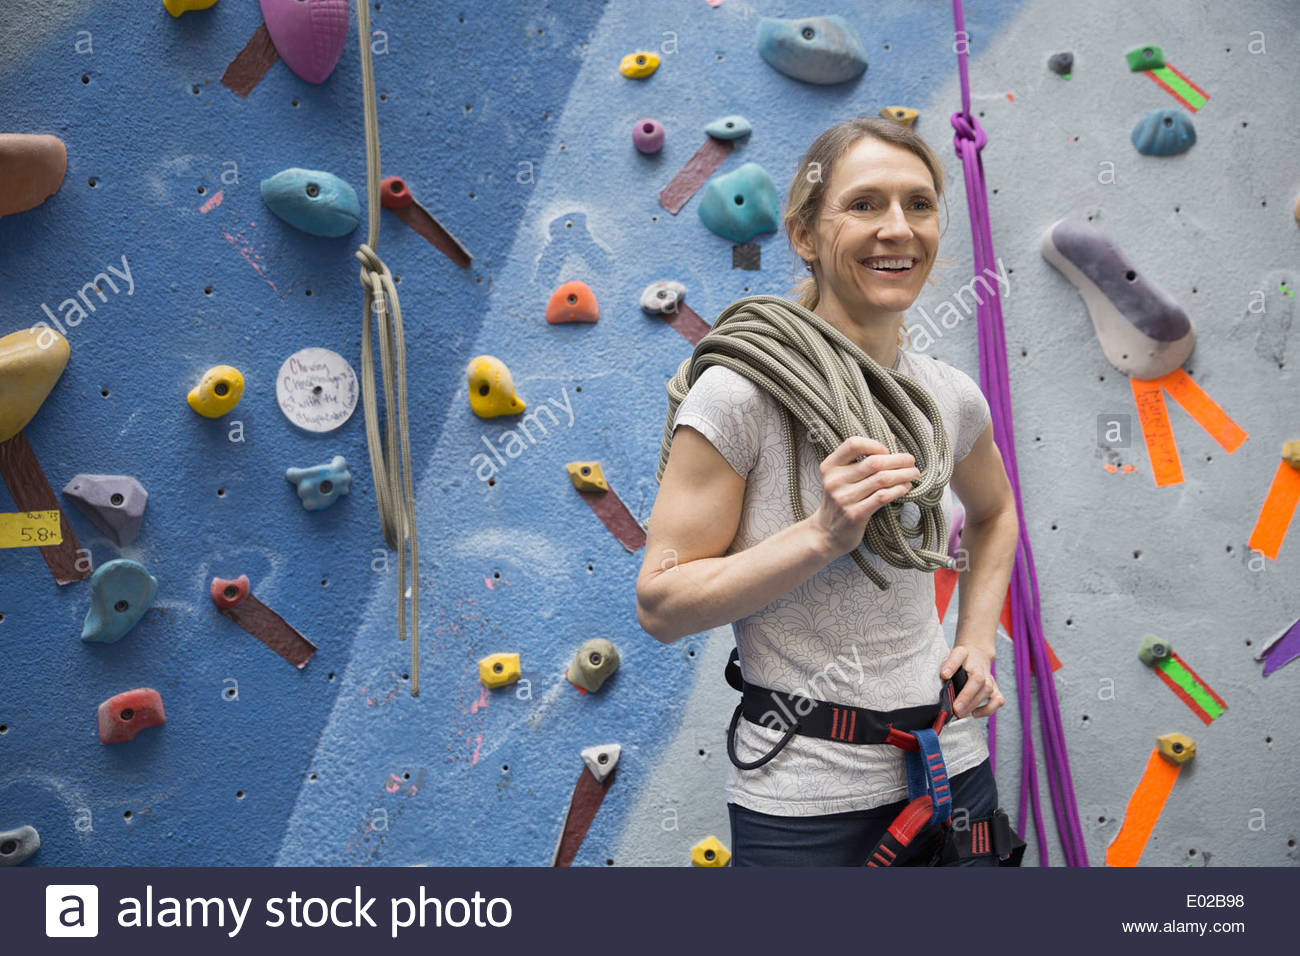 Smiling woman holding rope at rock climbing wall - Stock Image